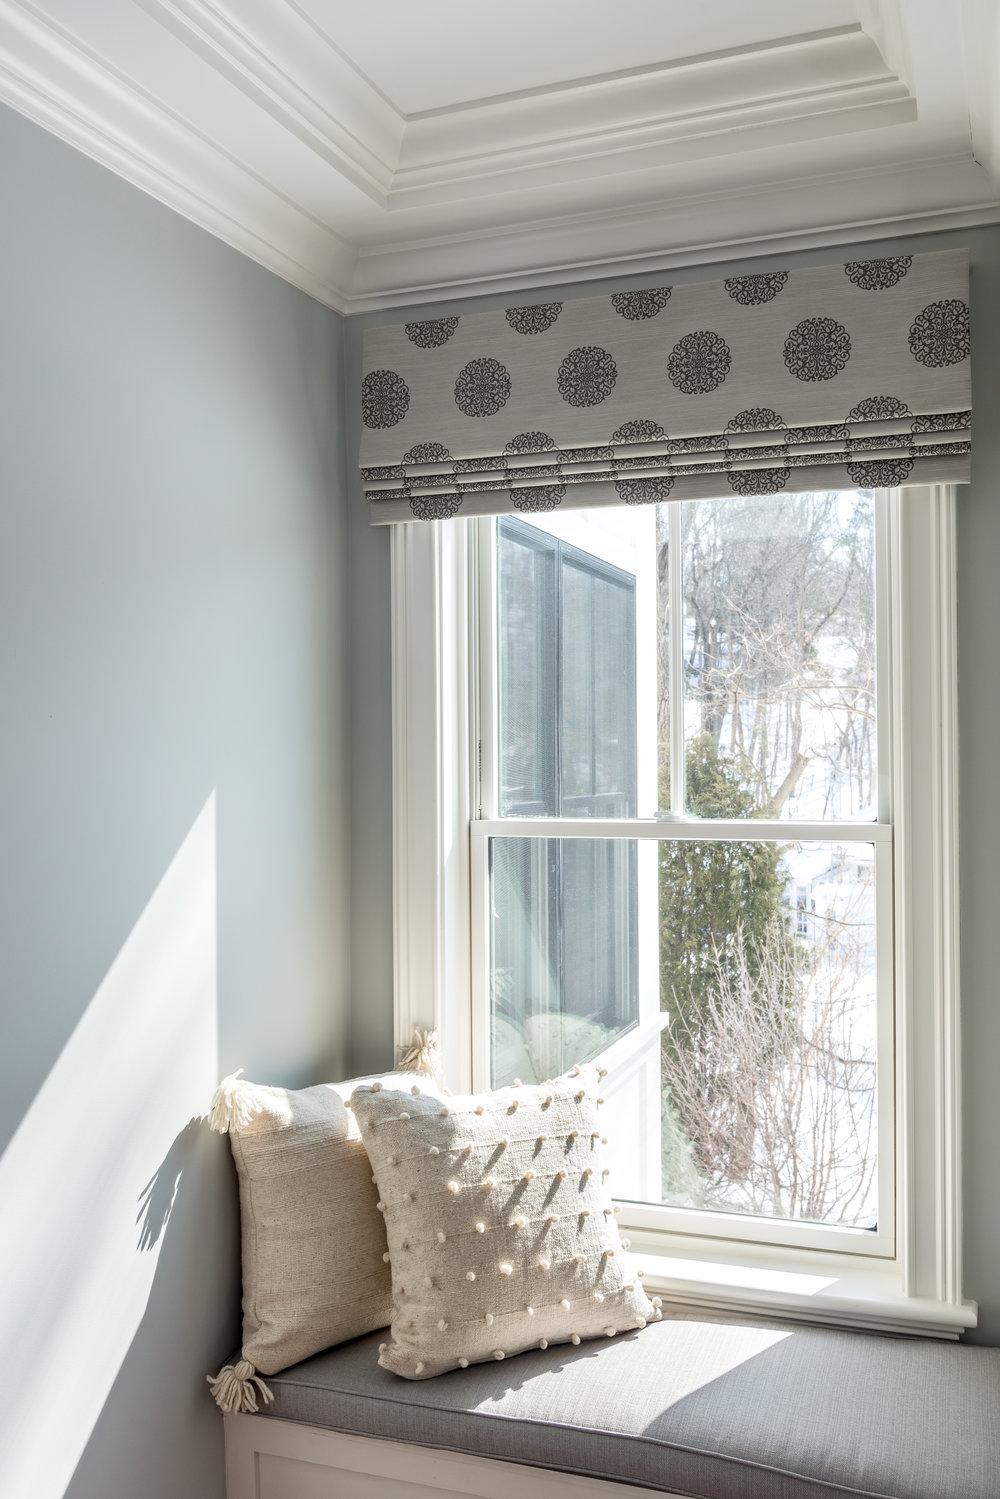 custom-window-treatment-design-workroom-drapery-shades-cornices-valances-carmel-valley-solana-beach-oceanside-california 1.jpg